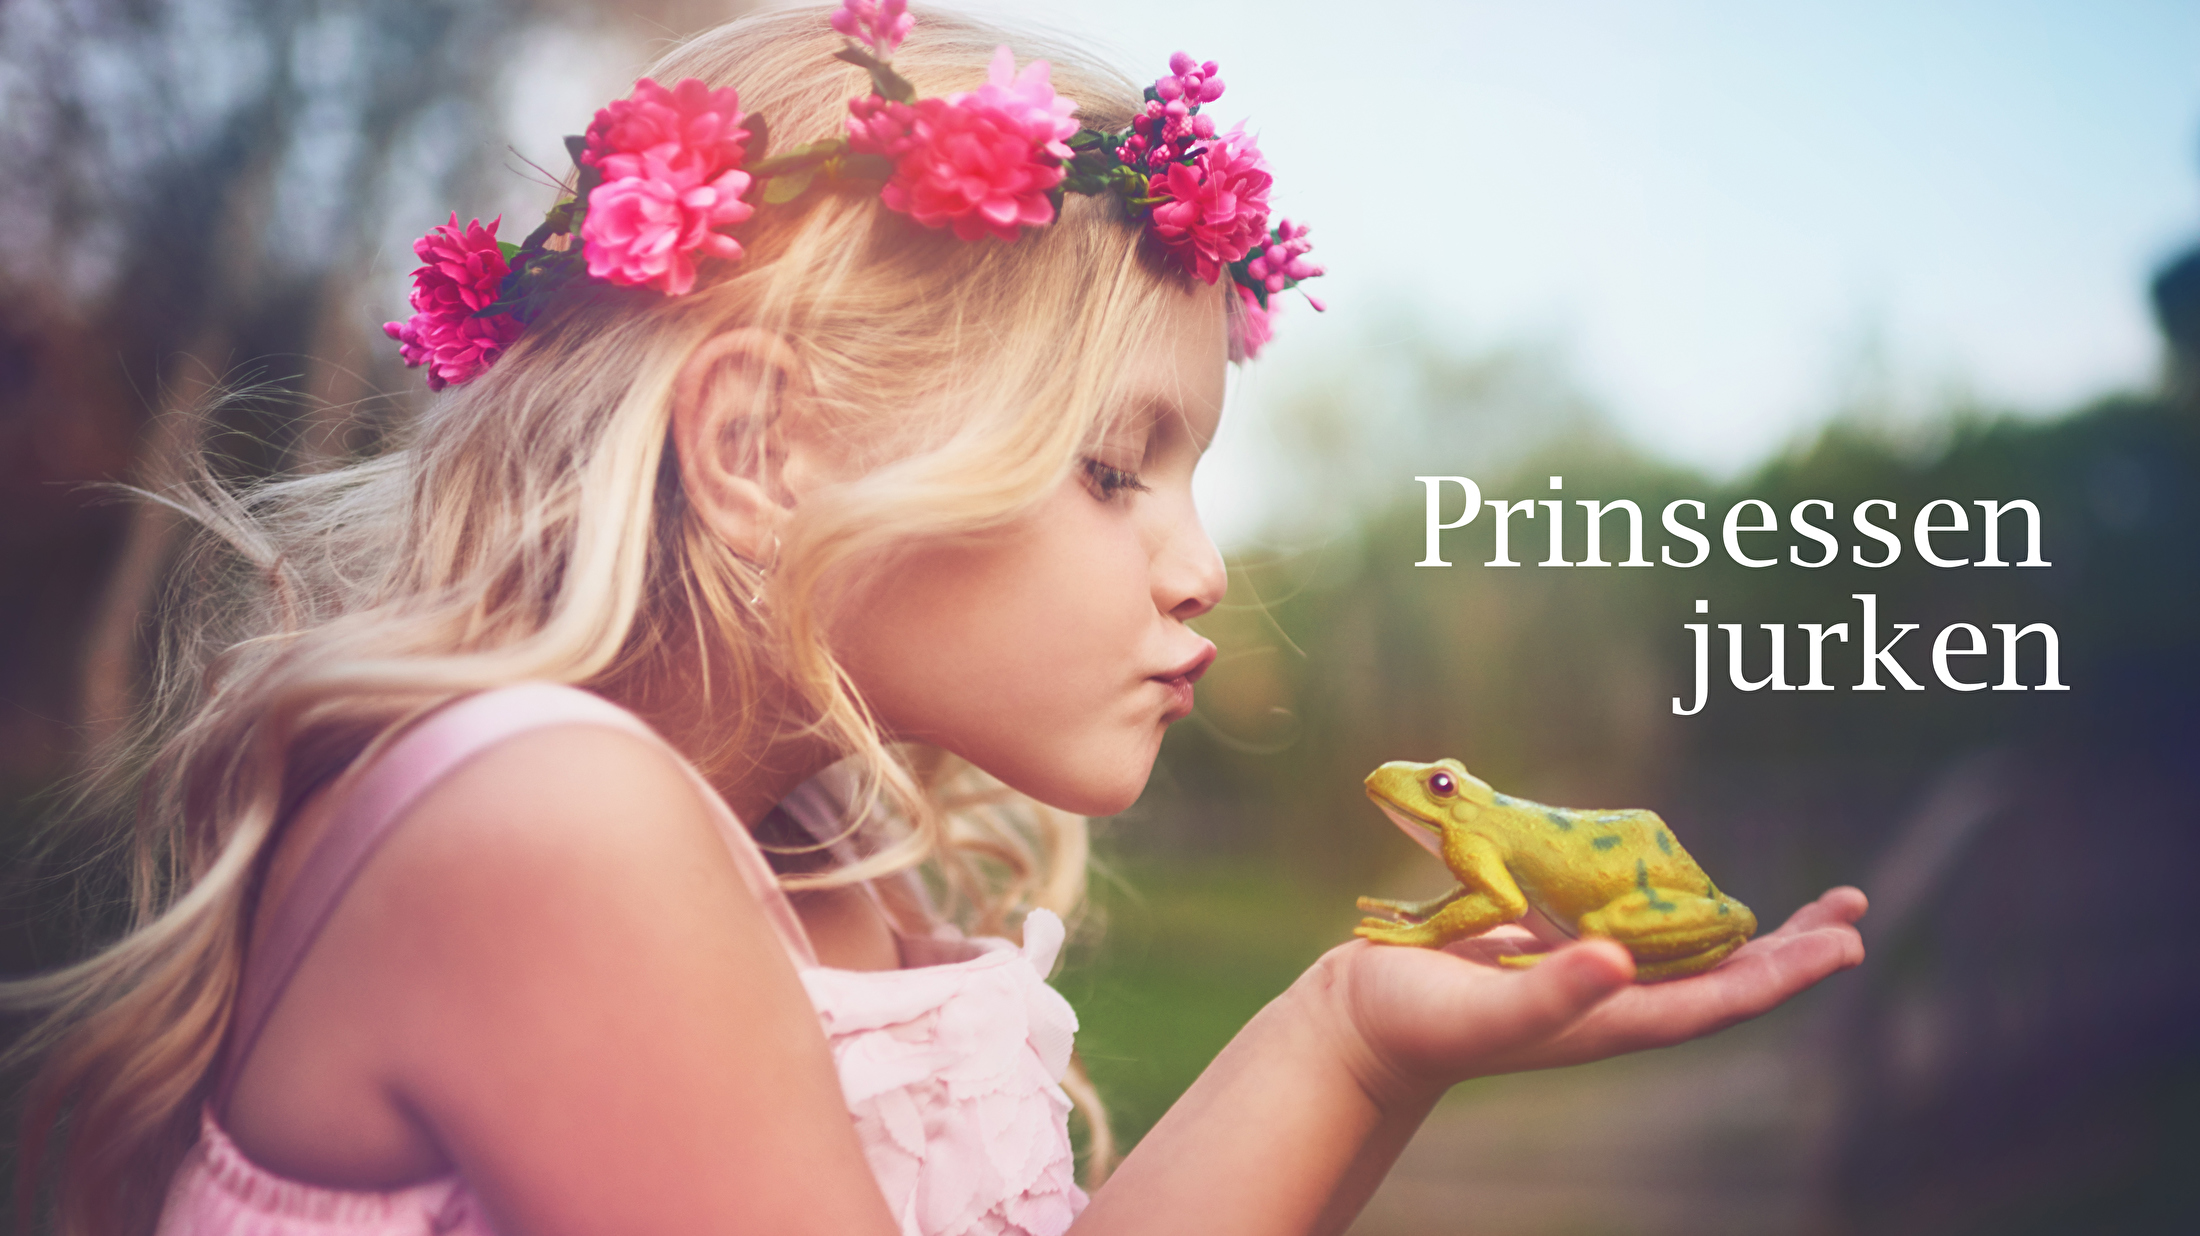 Prinsessen jurk Prinsessenjurken